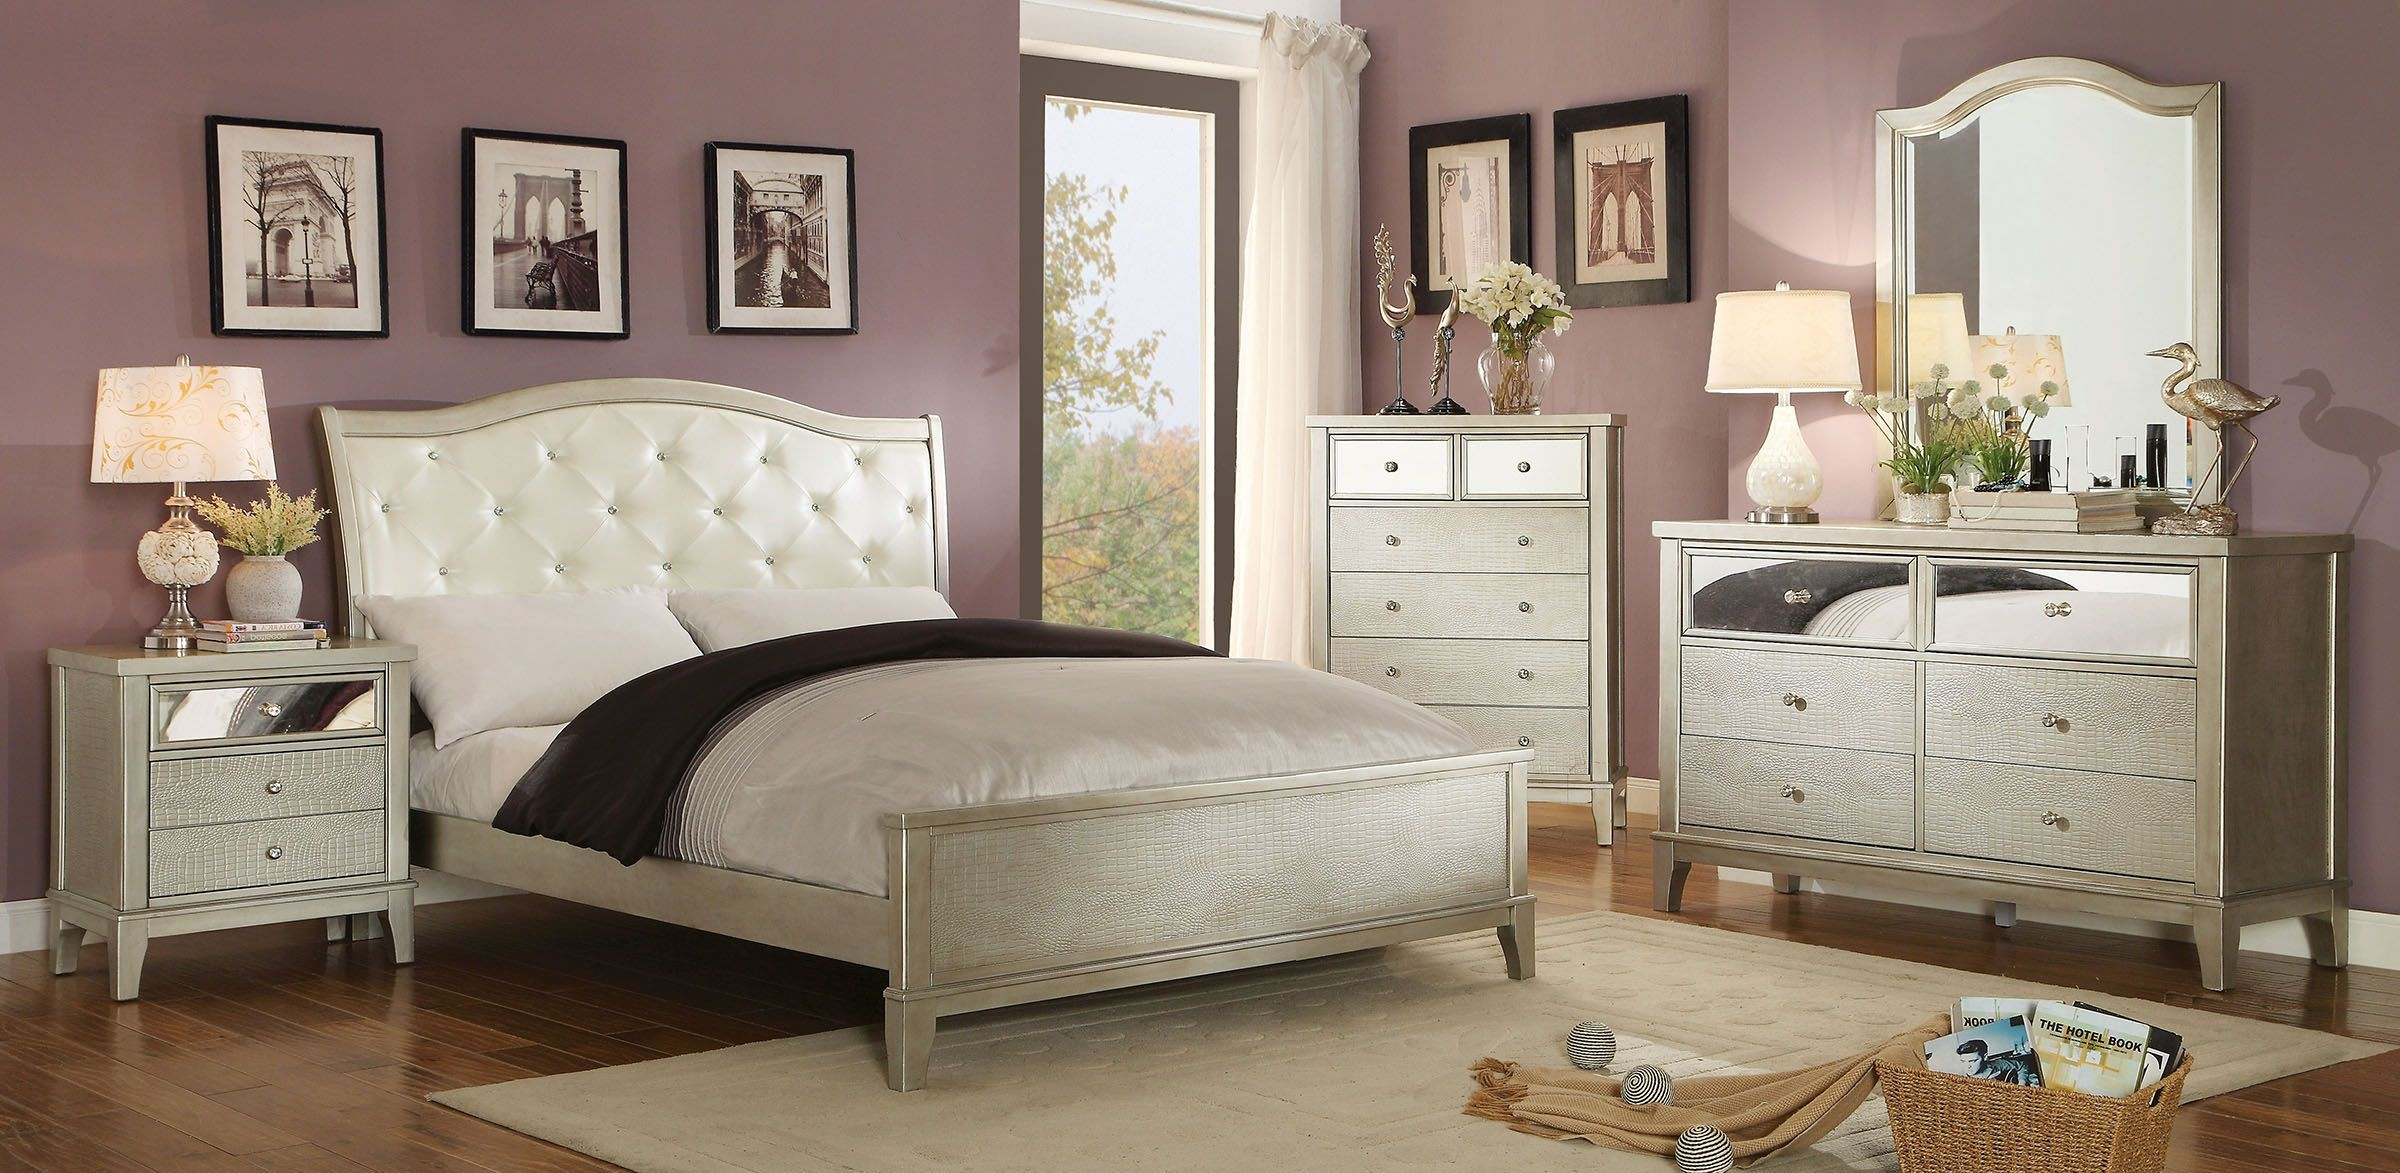 silver bedroom sets photo - 9